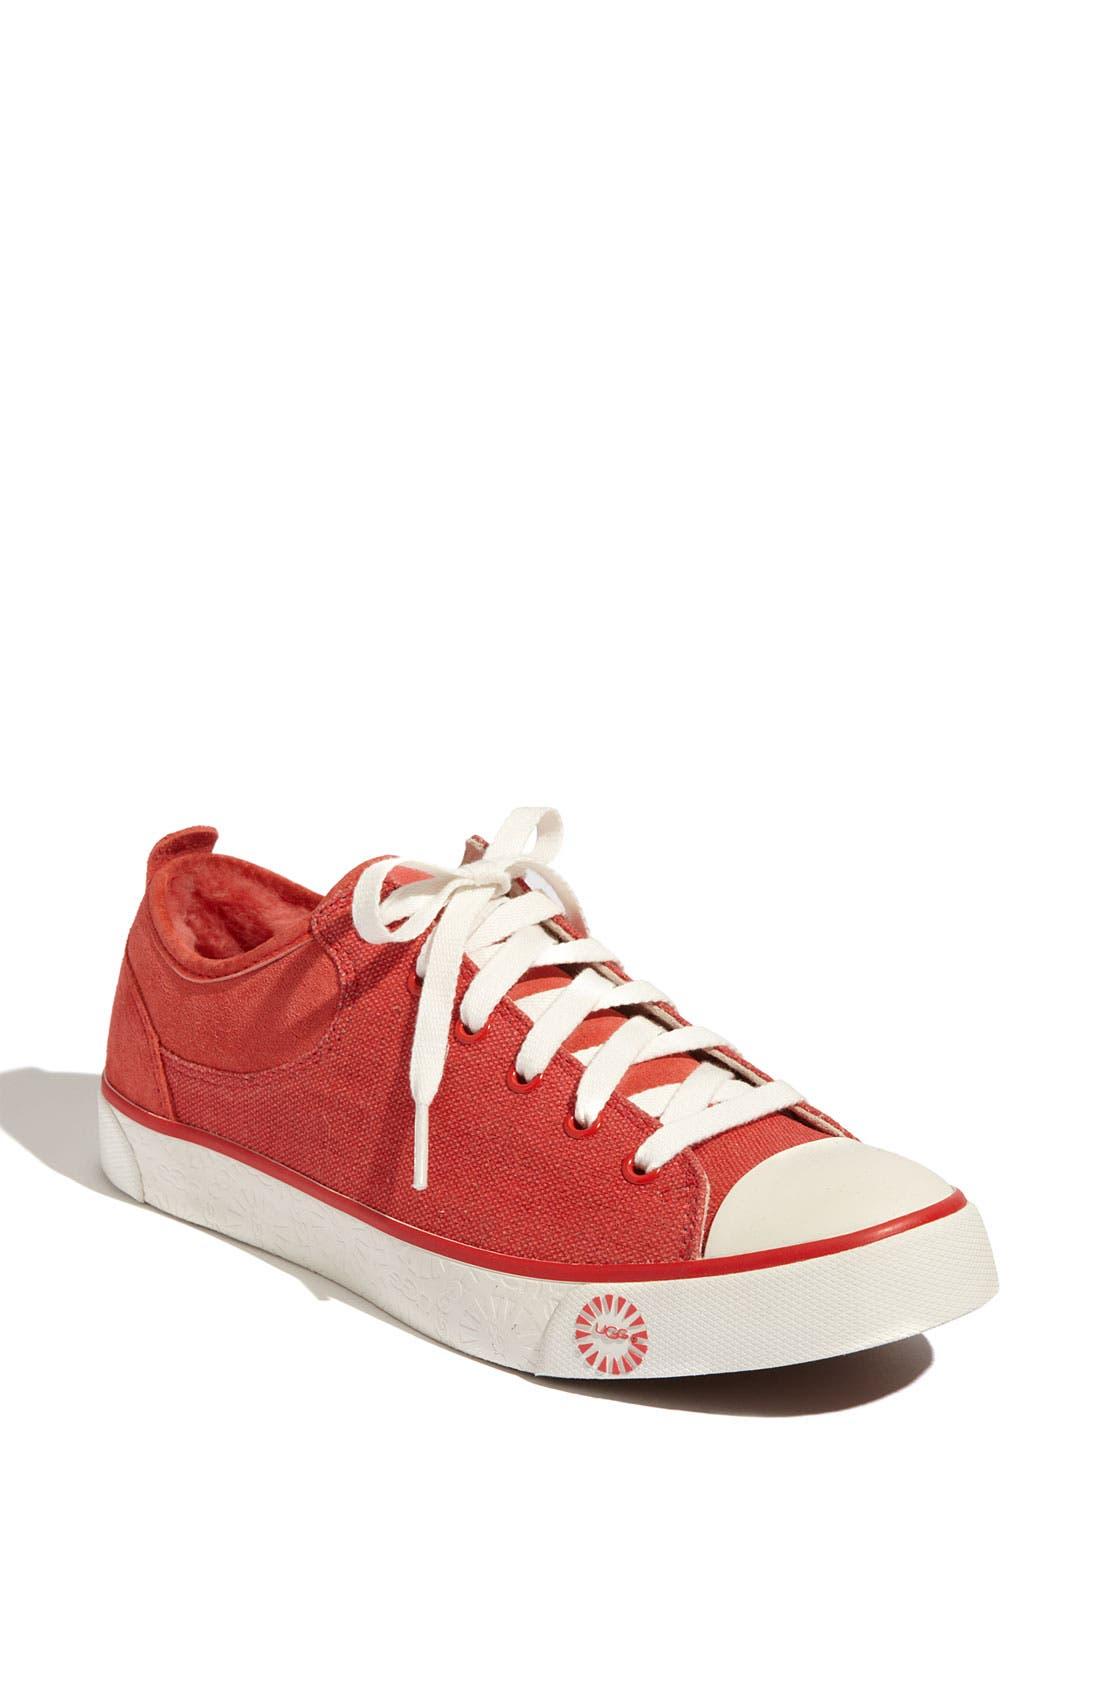 Alternate Image 1 Selected - UGG® Australia 'Evera' Sneaker (Women)